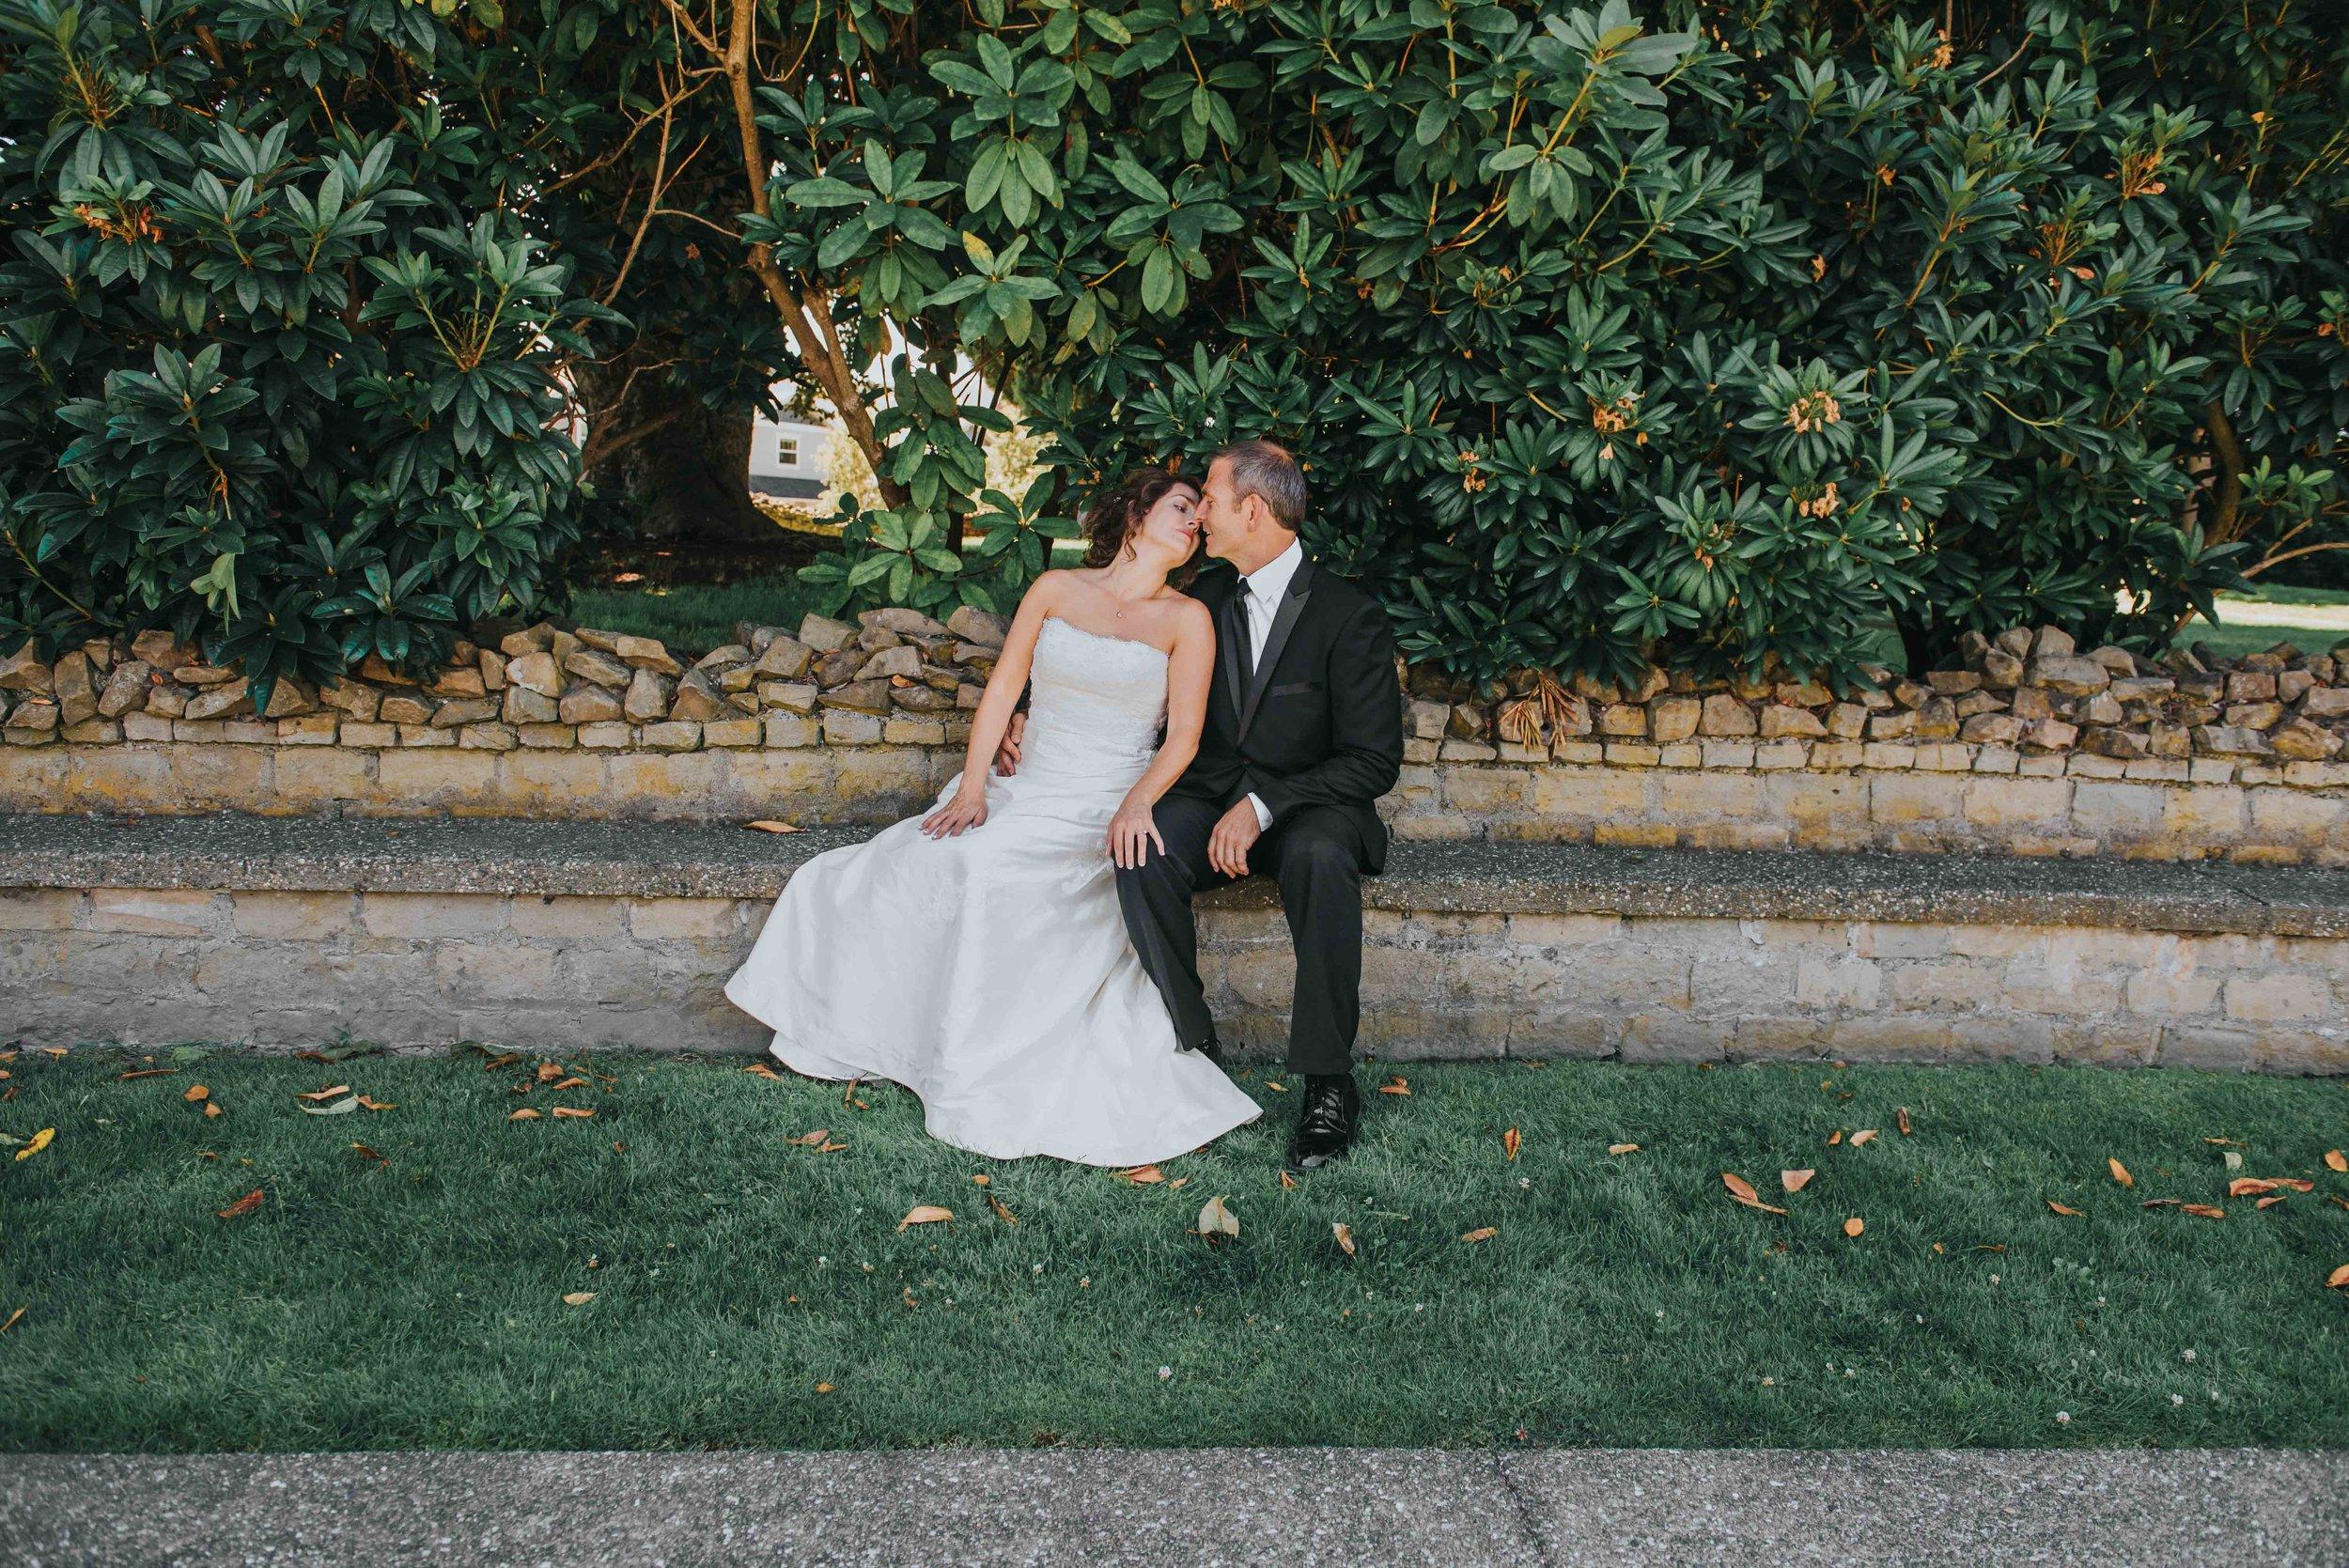 Cap-Sante-Wedding-J-Hodges-Anacortes-8.jpg